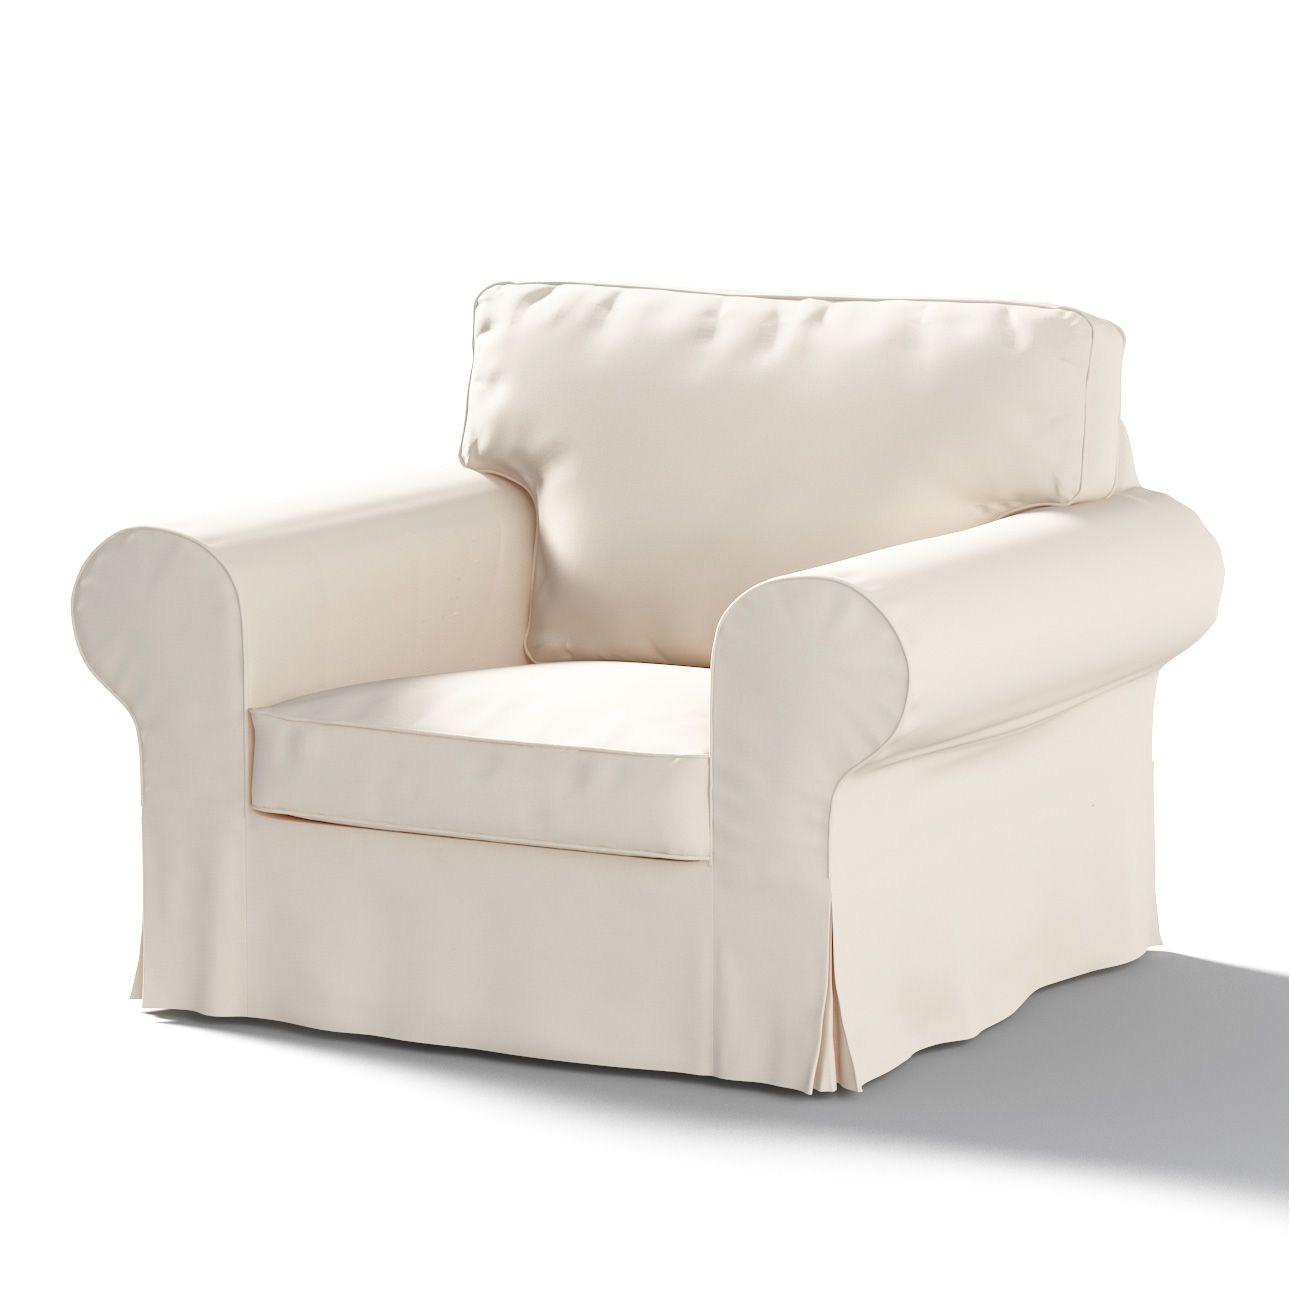 Chair And A Half Sleeper Ikea Adinaporter